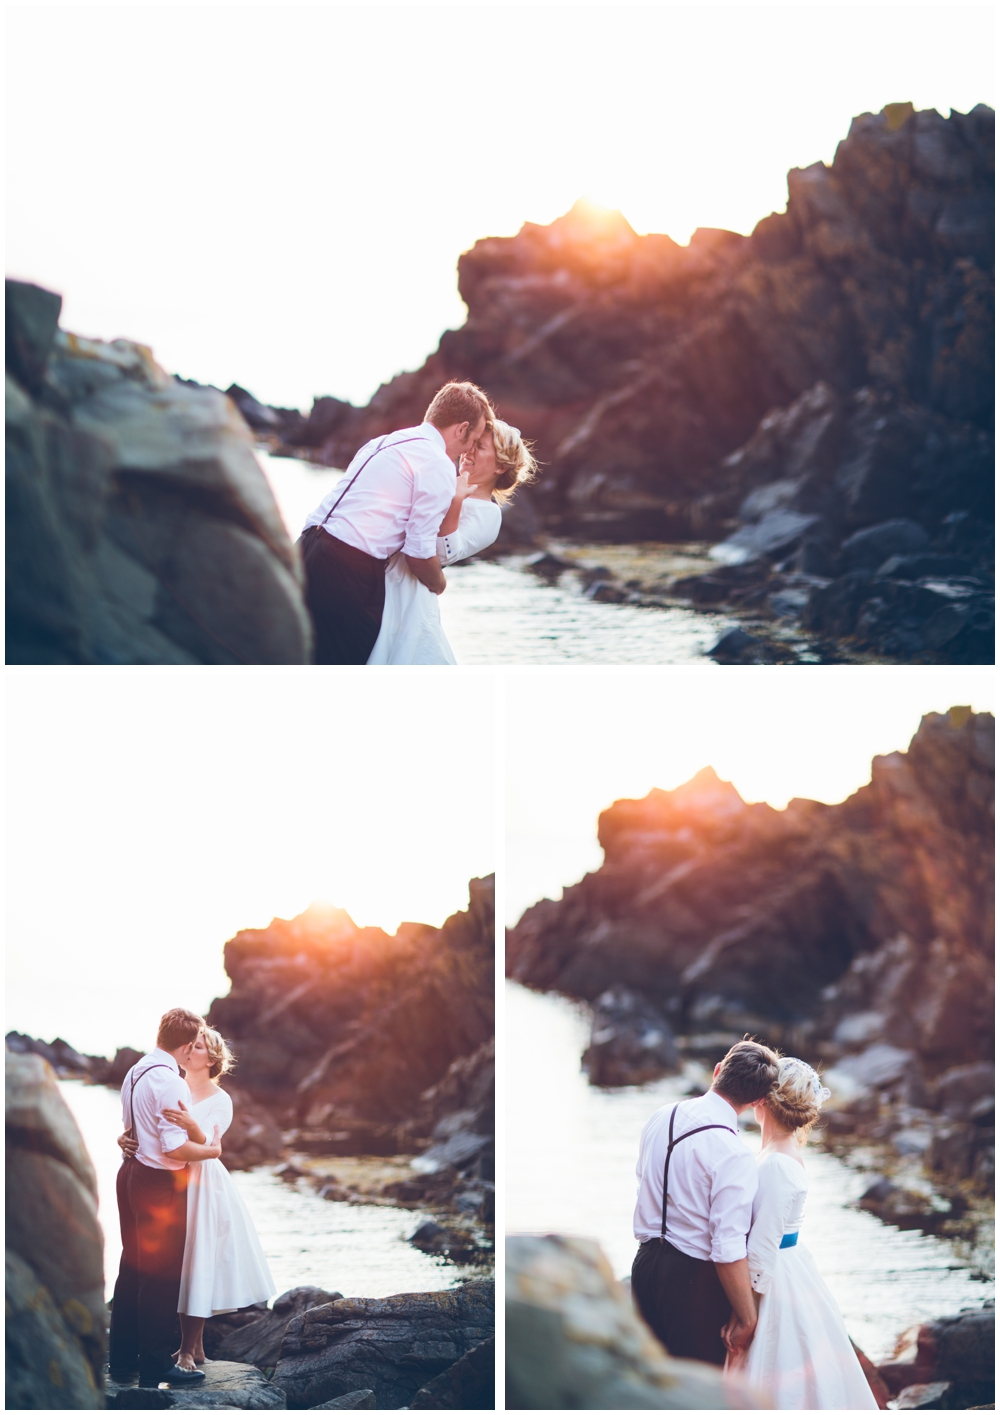 LE HAI LINH Photography-Hochzeitsfotograf-afterweddingshooting-malmoe-schweden_tzutzi.jpg